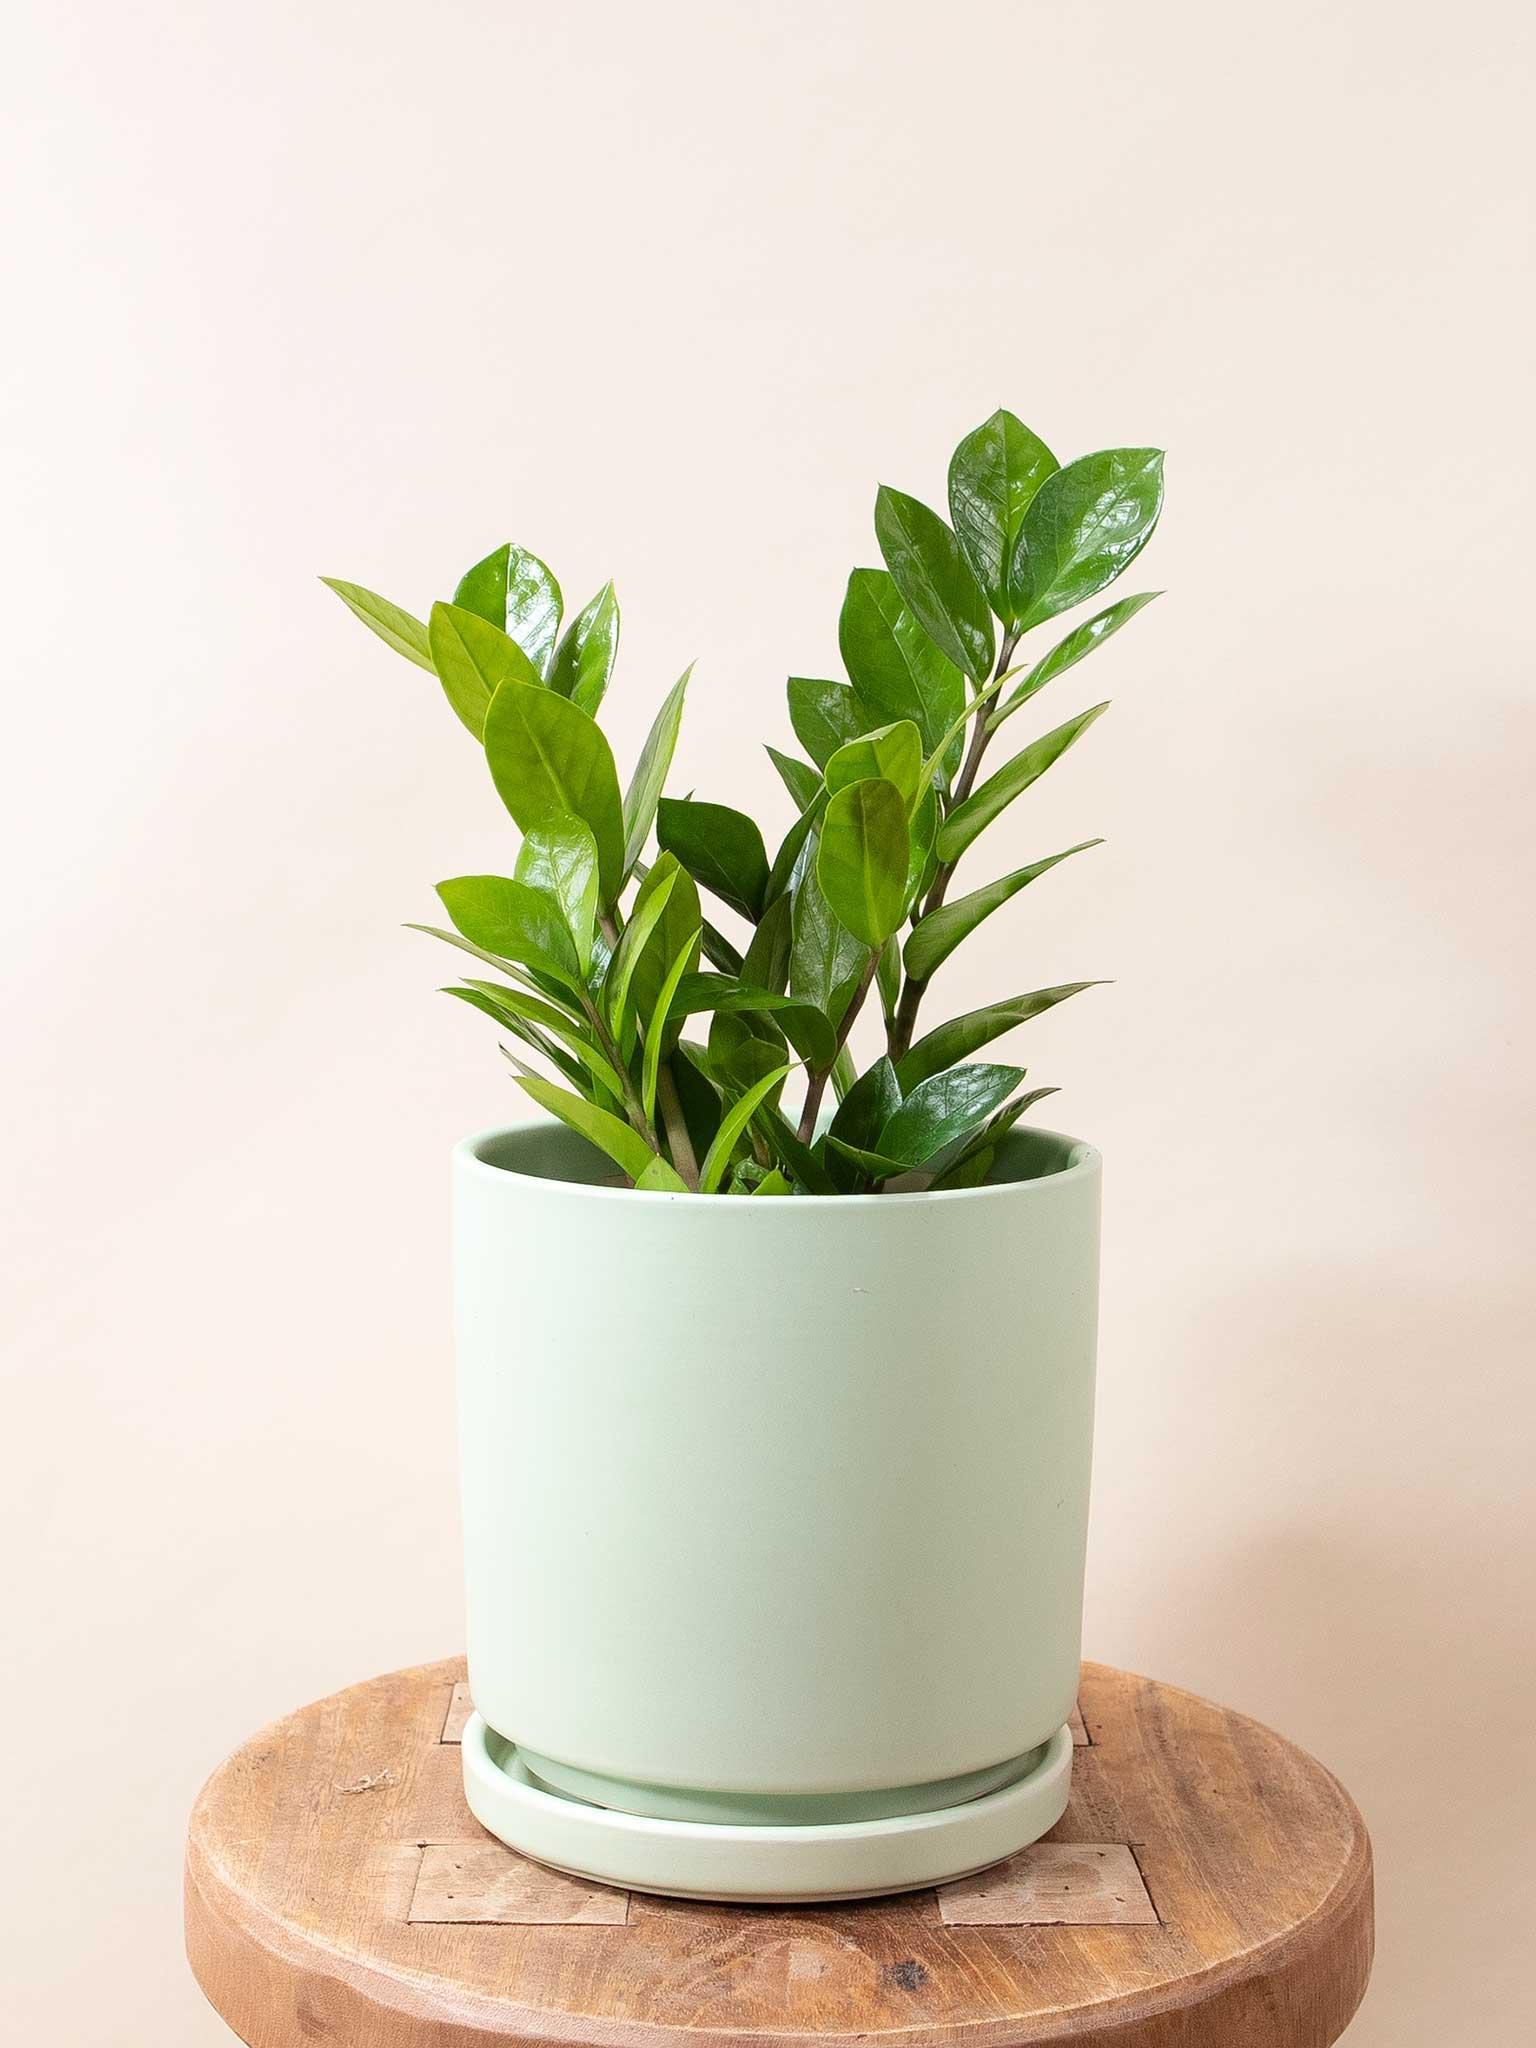 ZZ plant on a stool